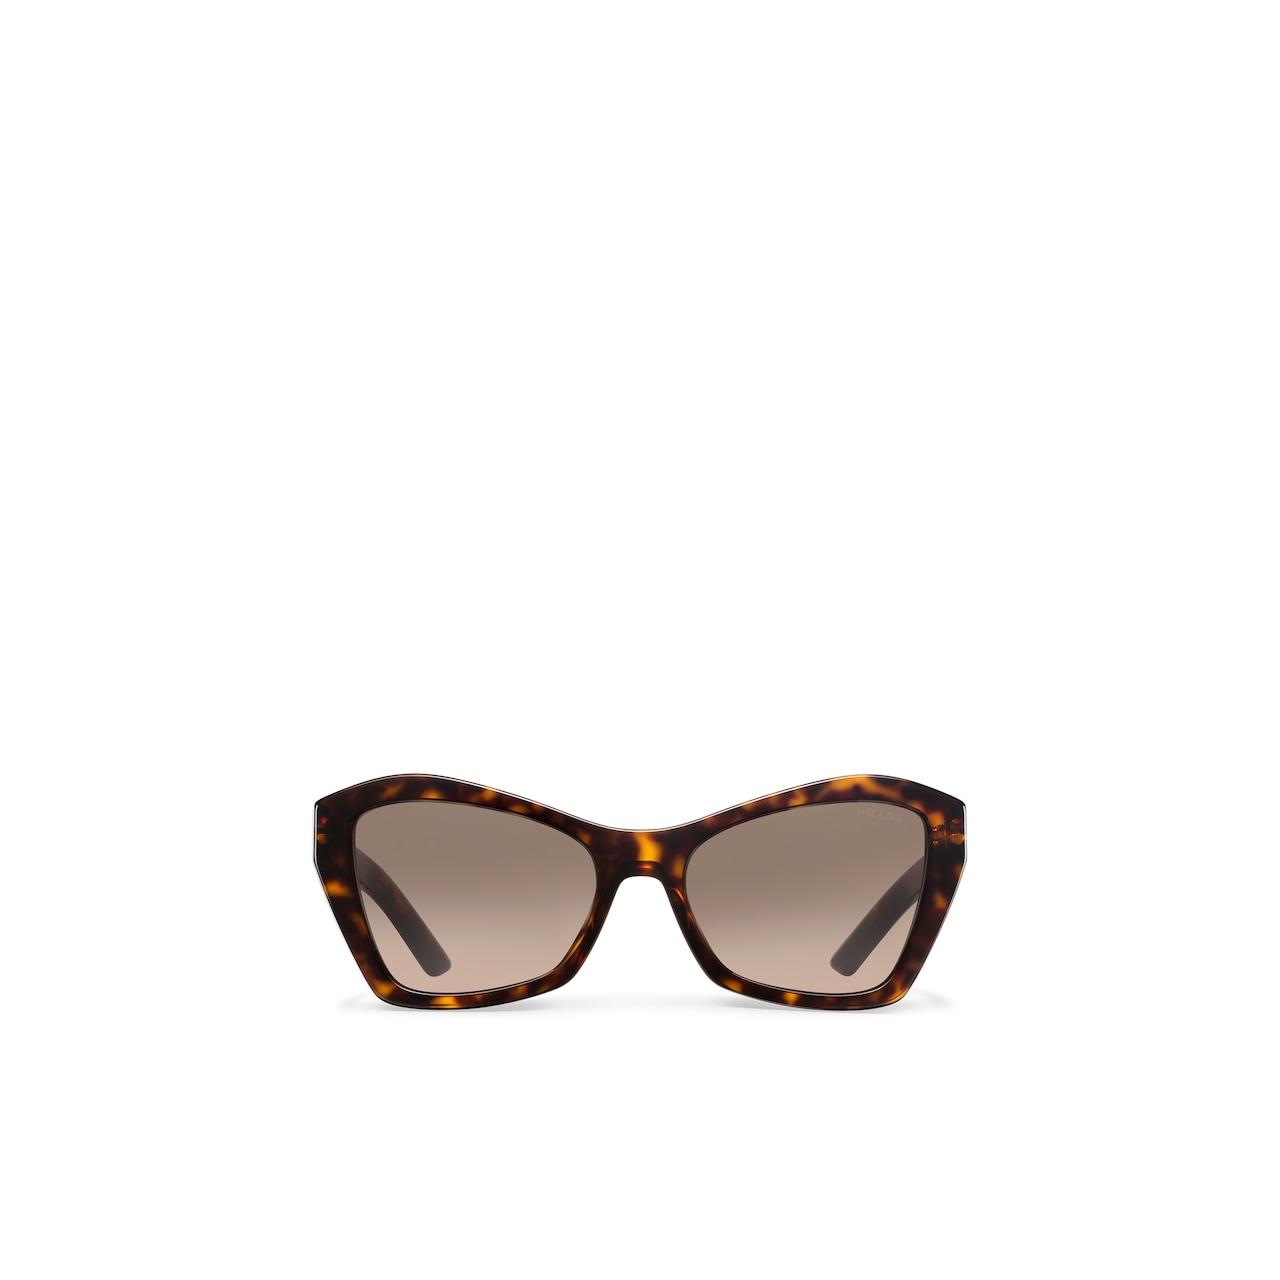 Prada Prada Disguise sunglasses 1